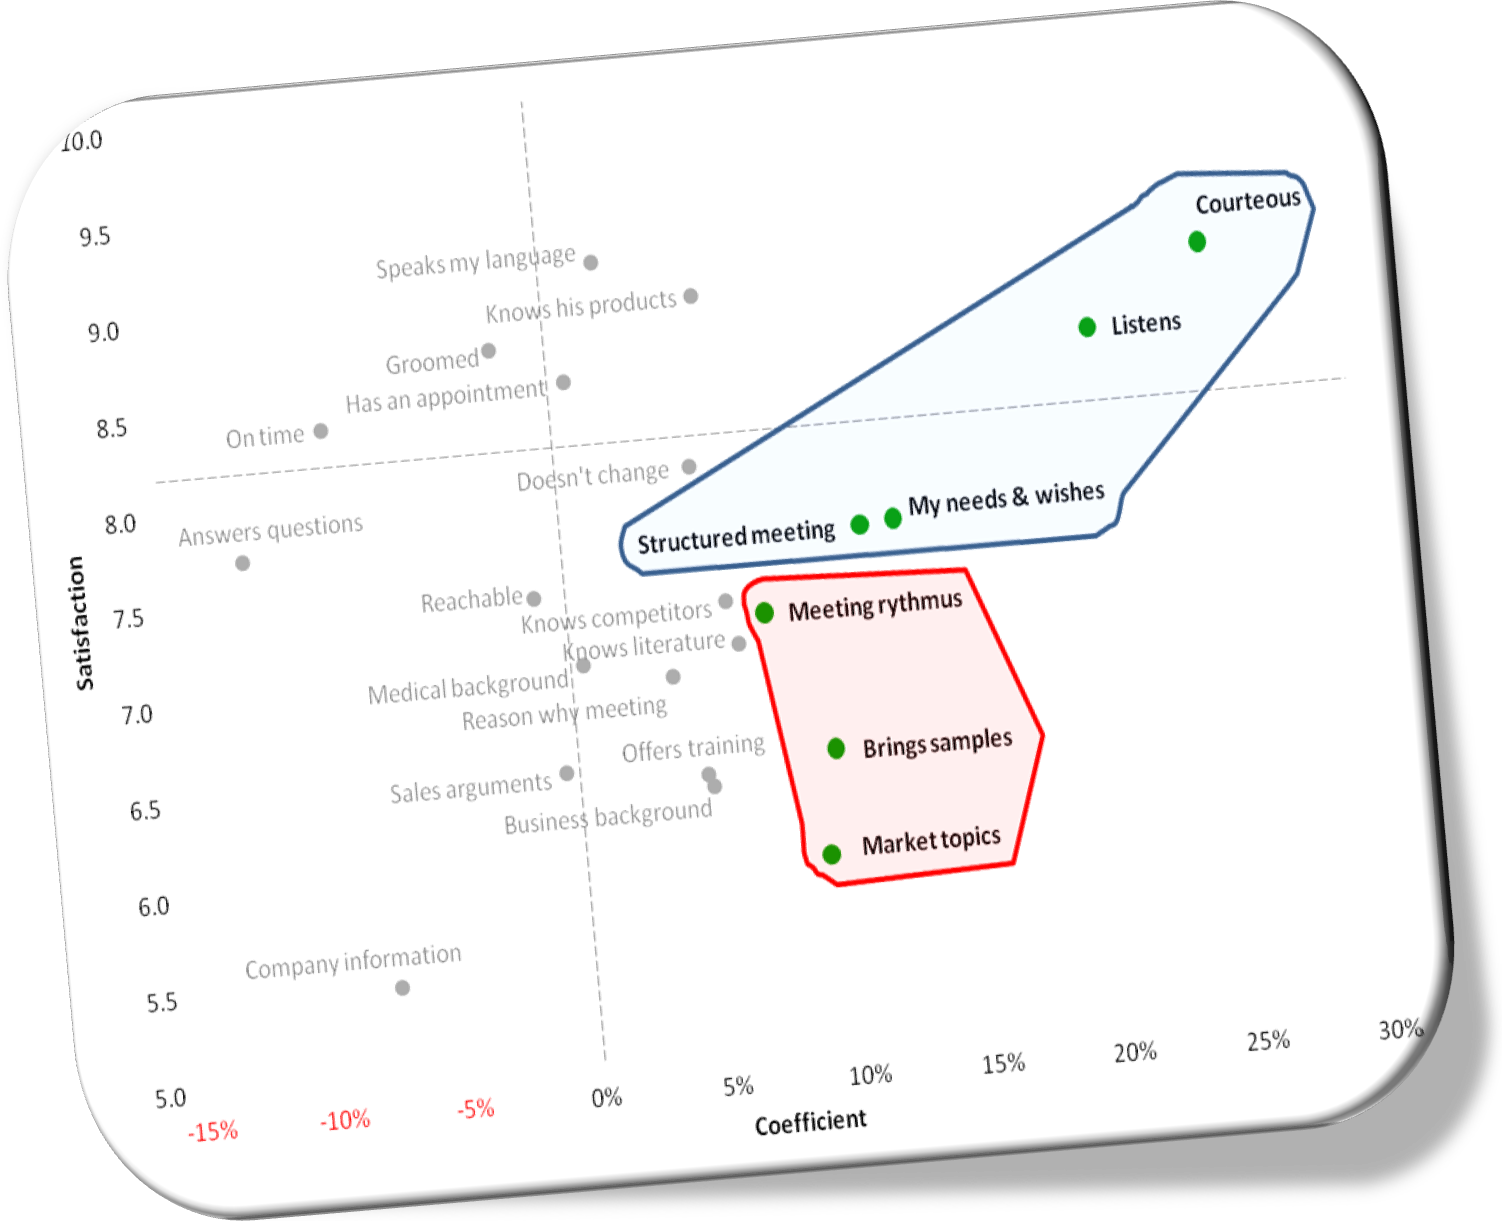 Regression coefficients customer satisfaction